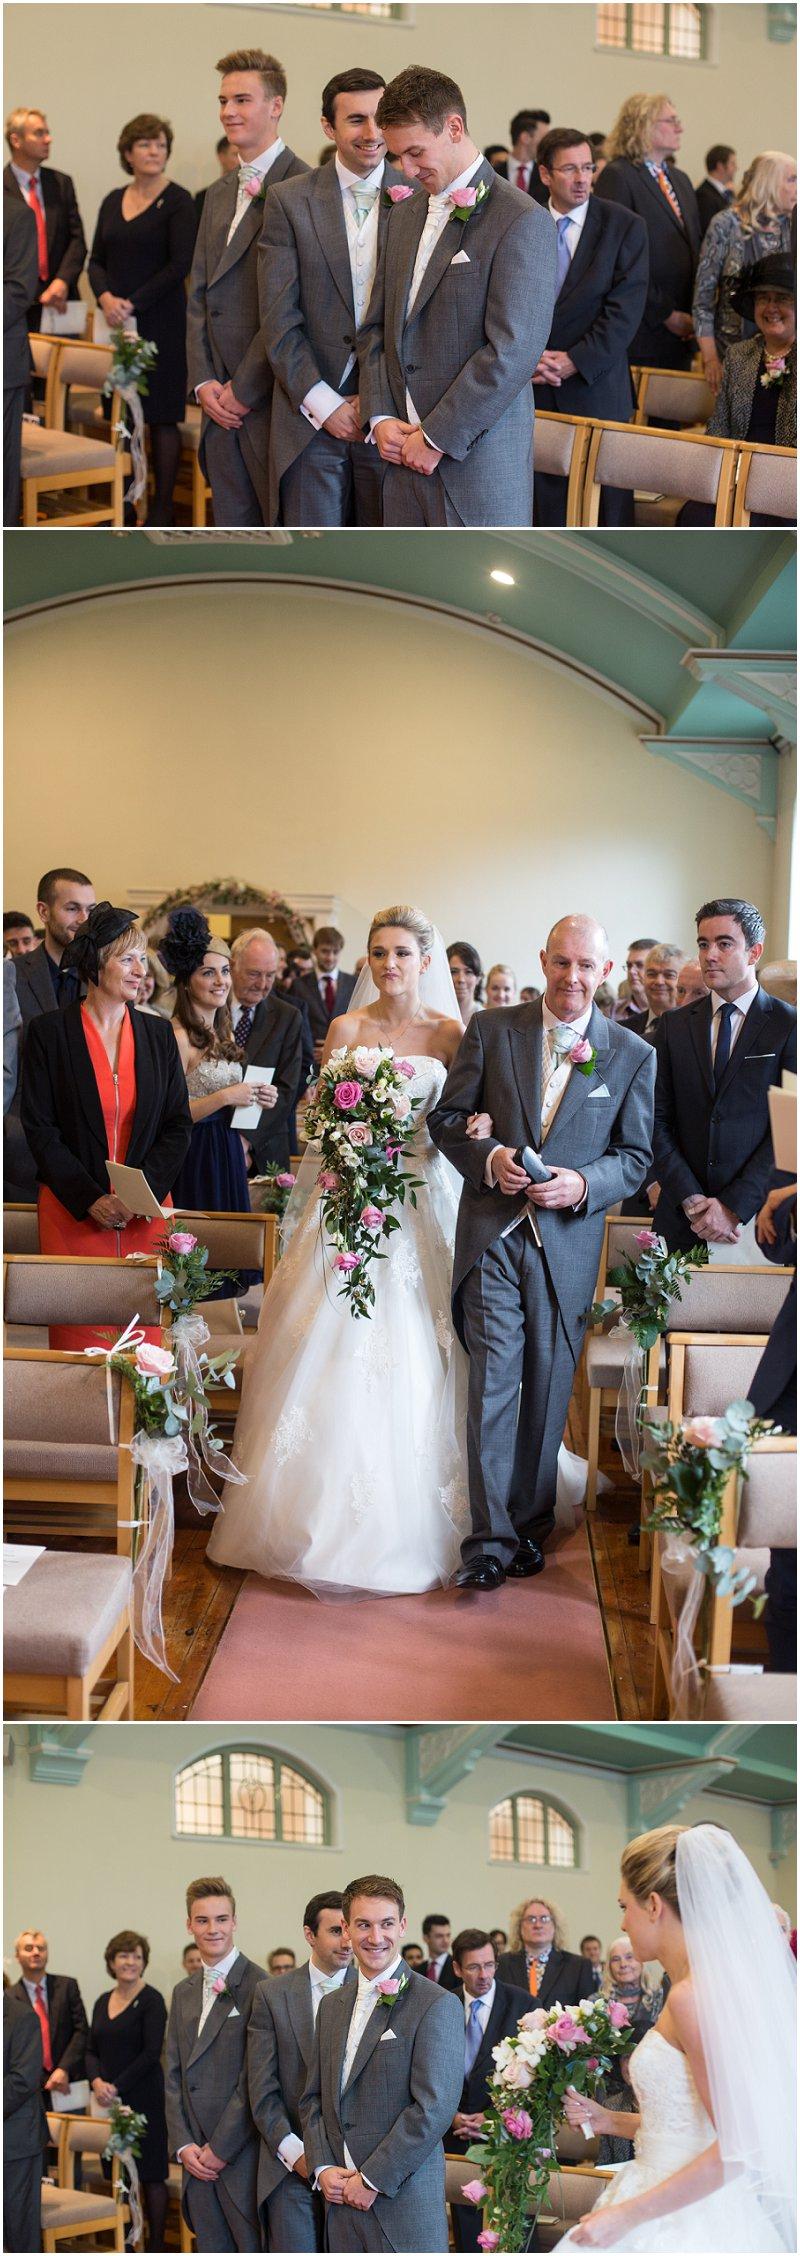 Wedding Ceremony at Chester Wedding